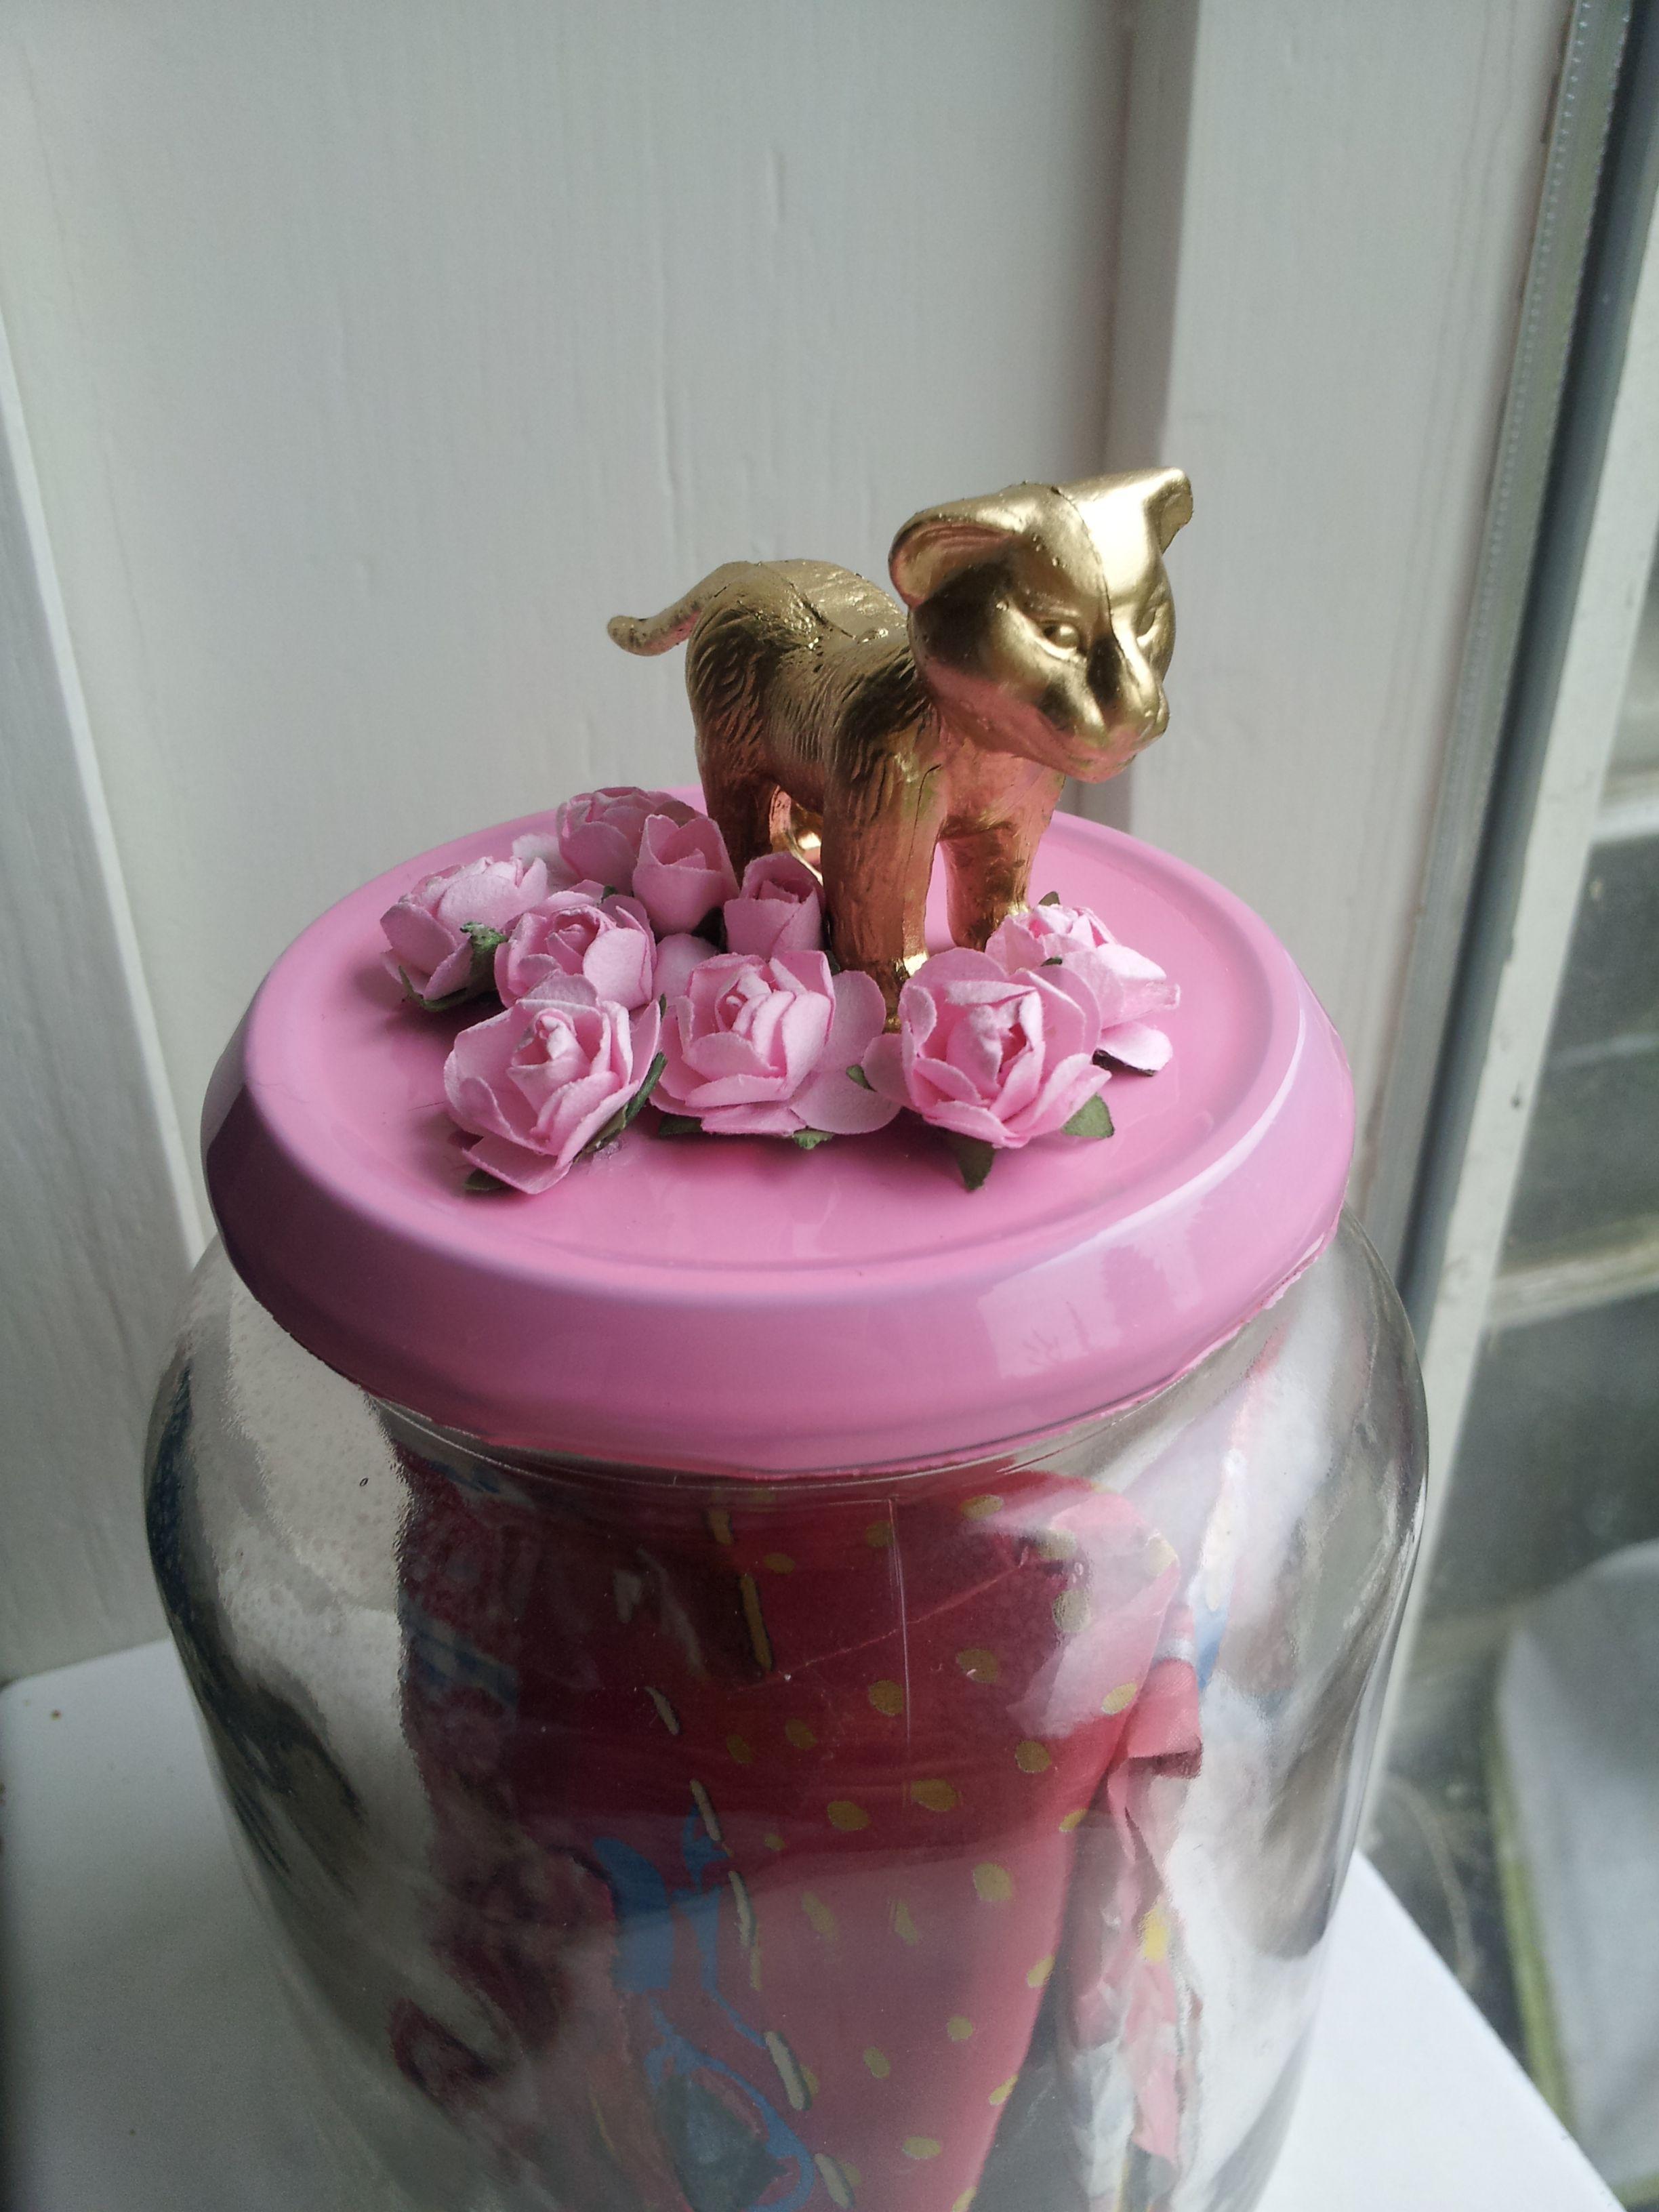 Very cute #diy #present for a little #girl